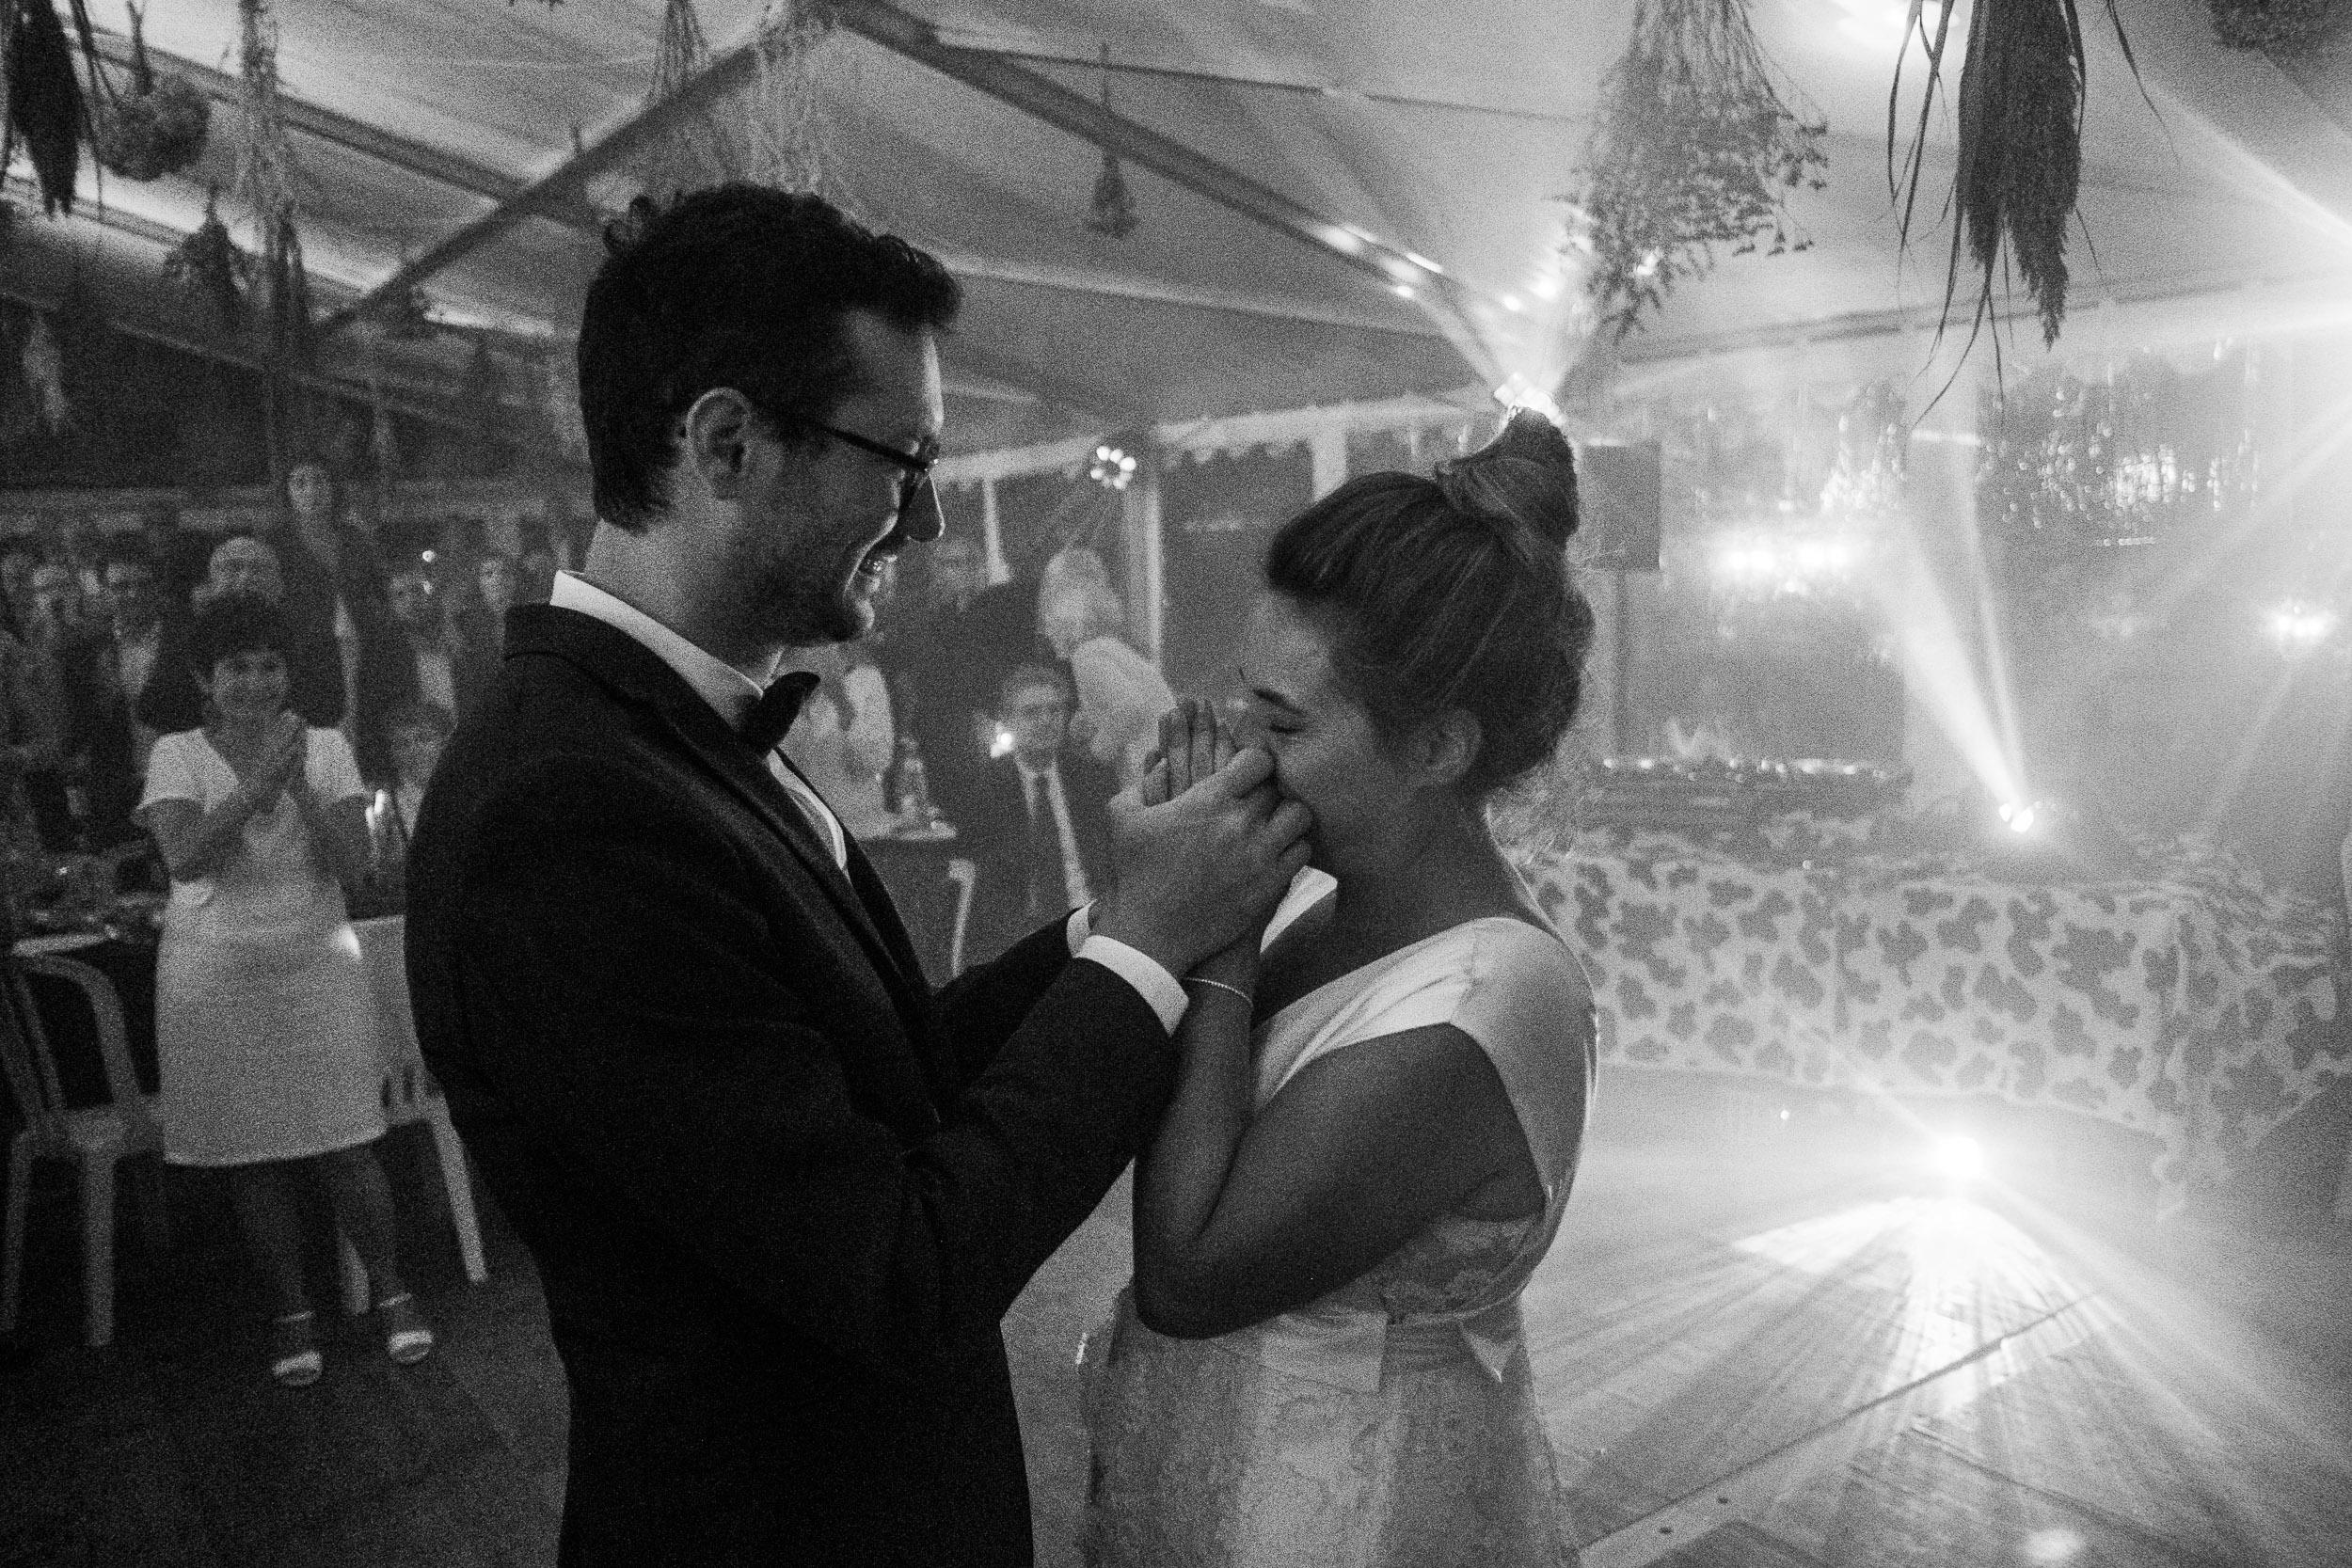 gerald-mattel-photographe-mariage-annecy-verrier-menthon-16.jpg